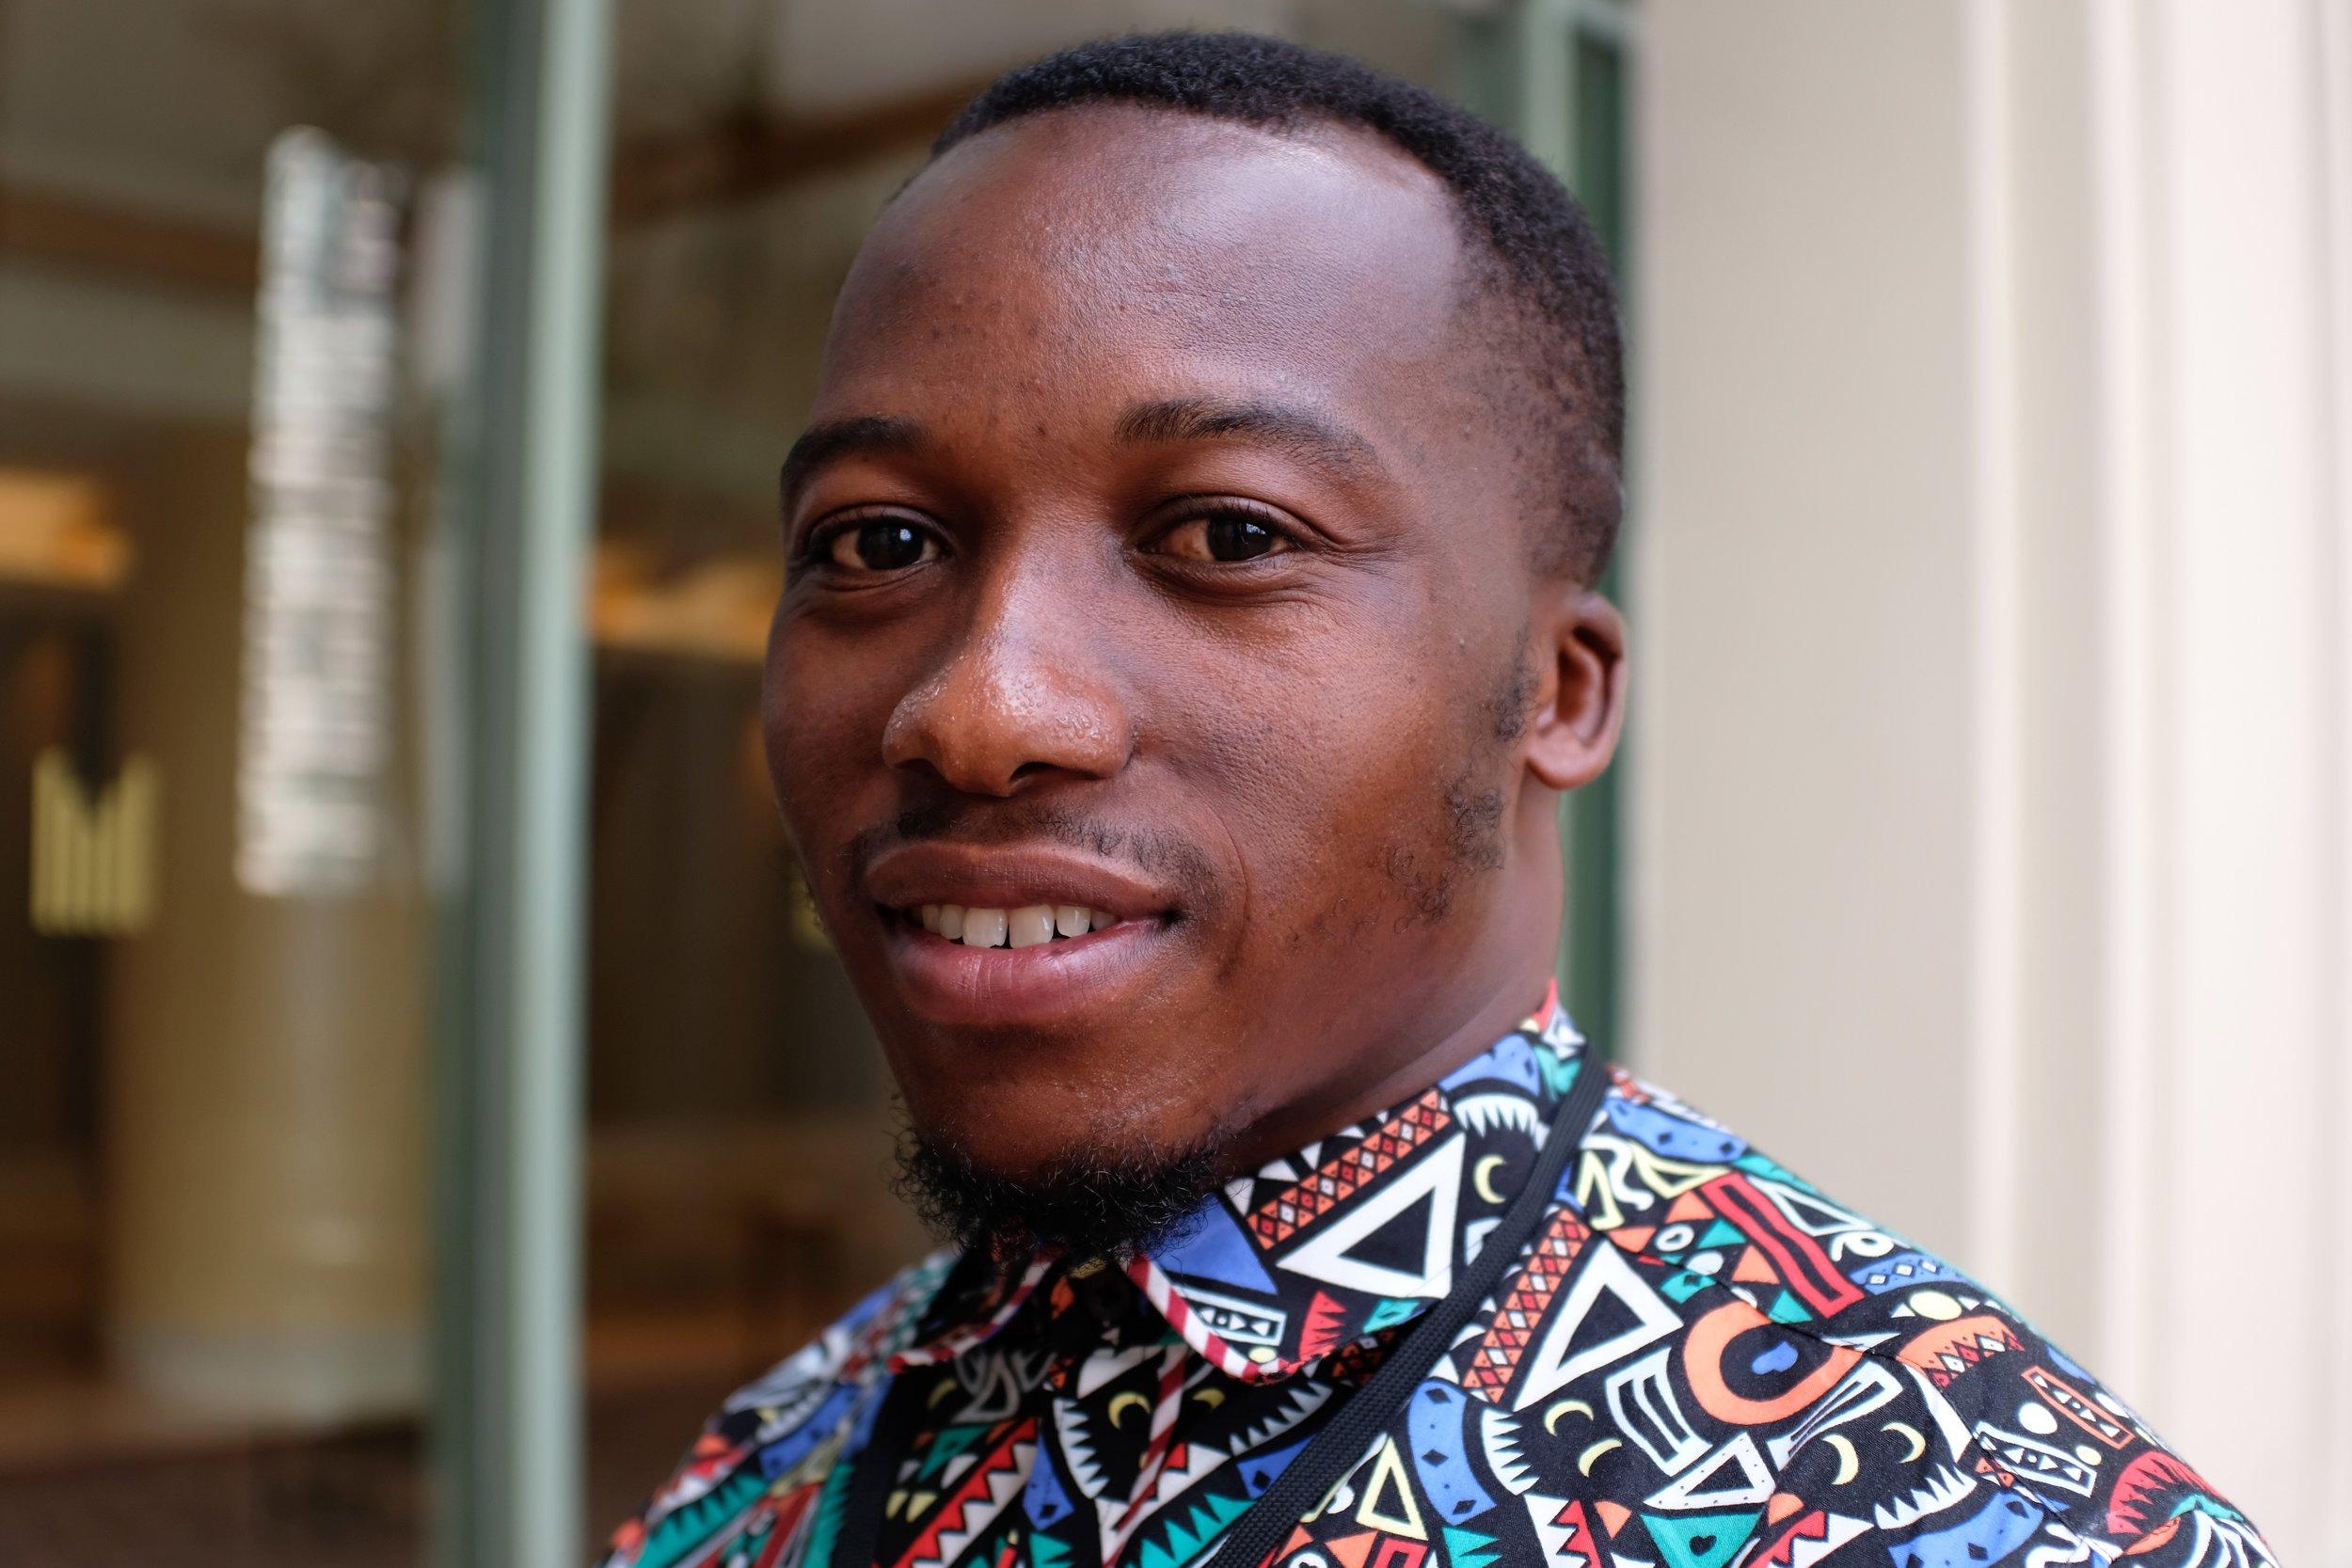 Richard Appiah Akoto from Ghana to Singapore